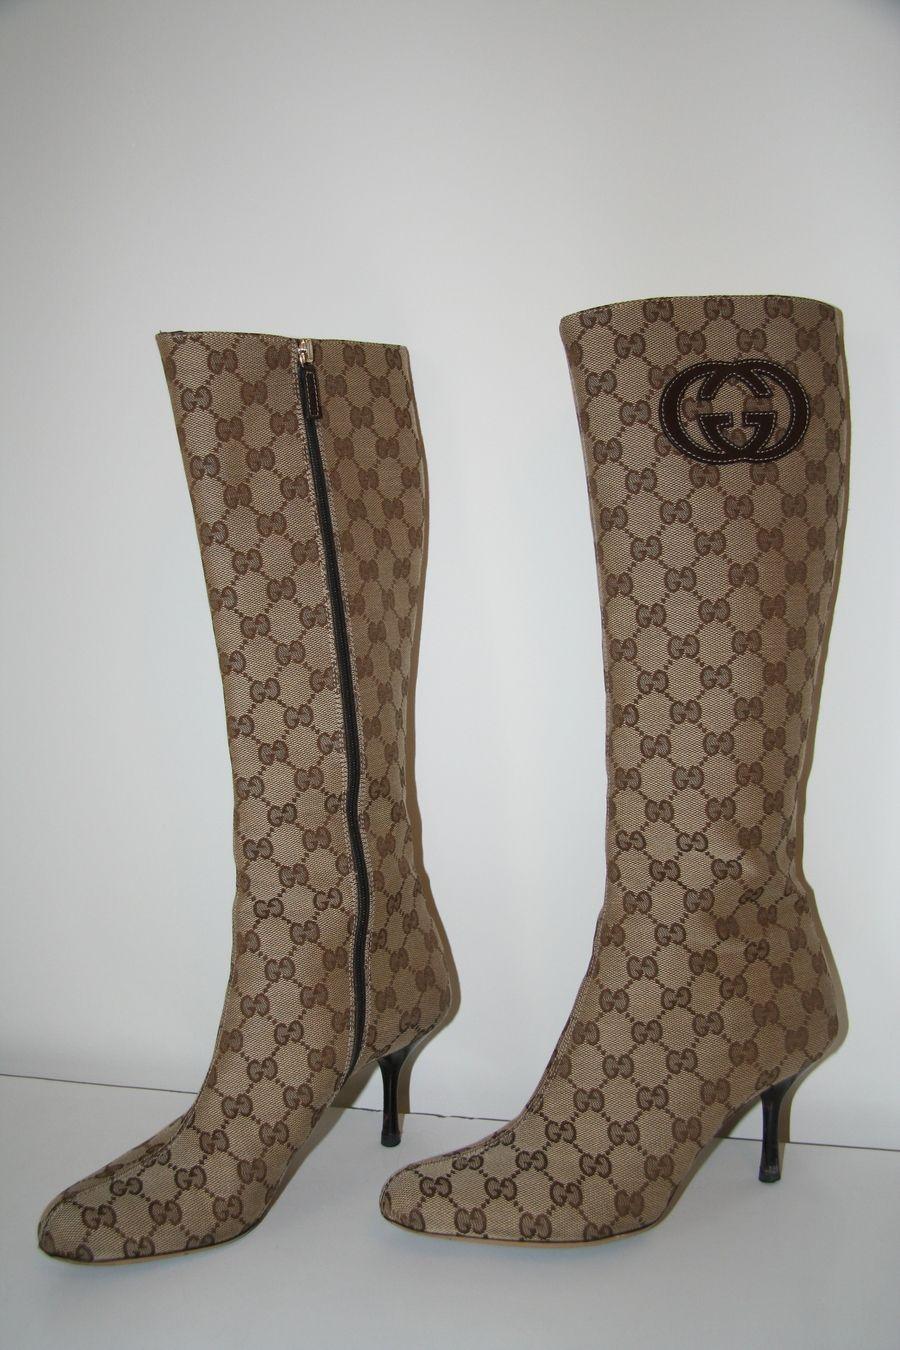 Gucci Boots @FollowShopHers